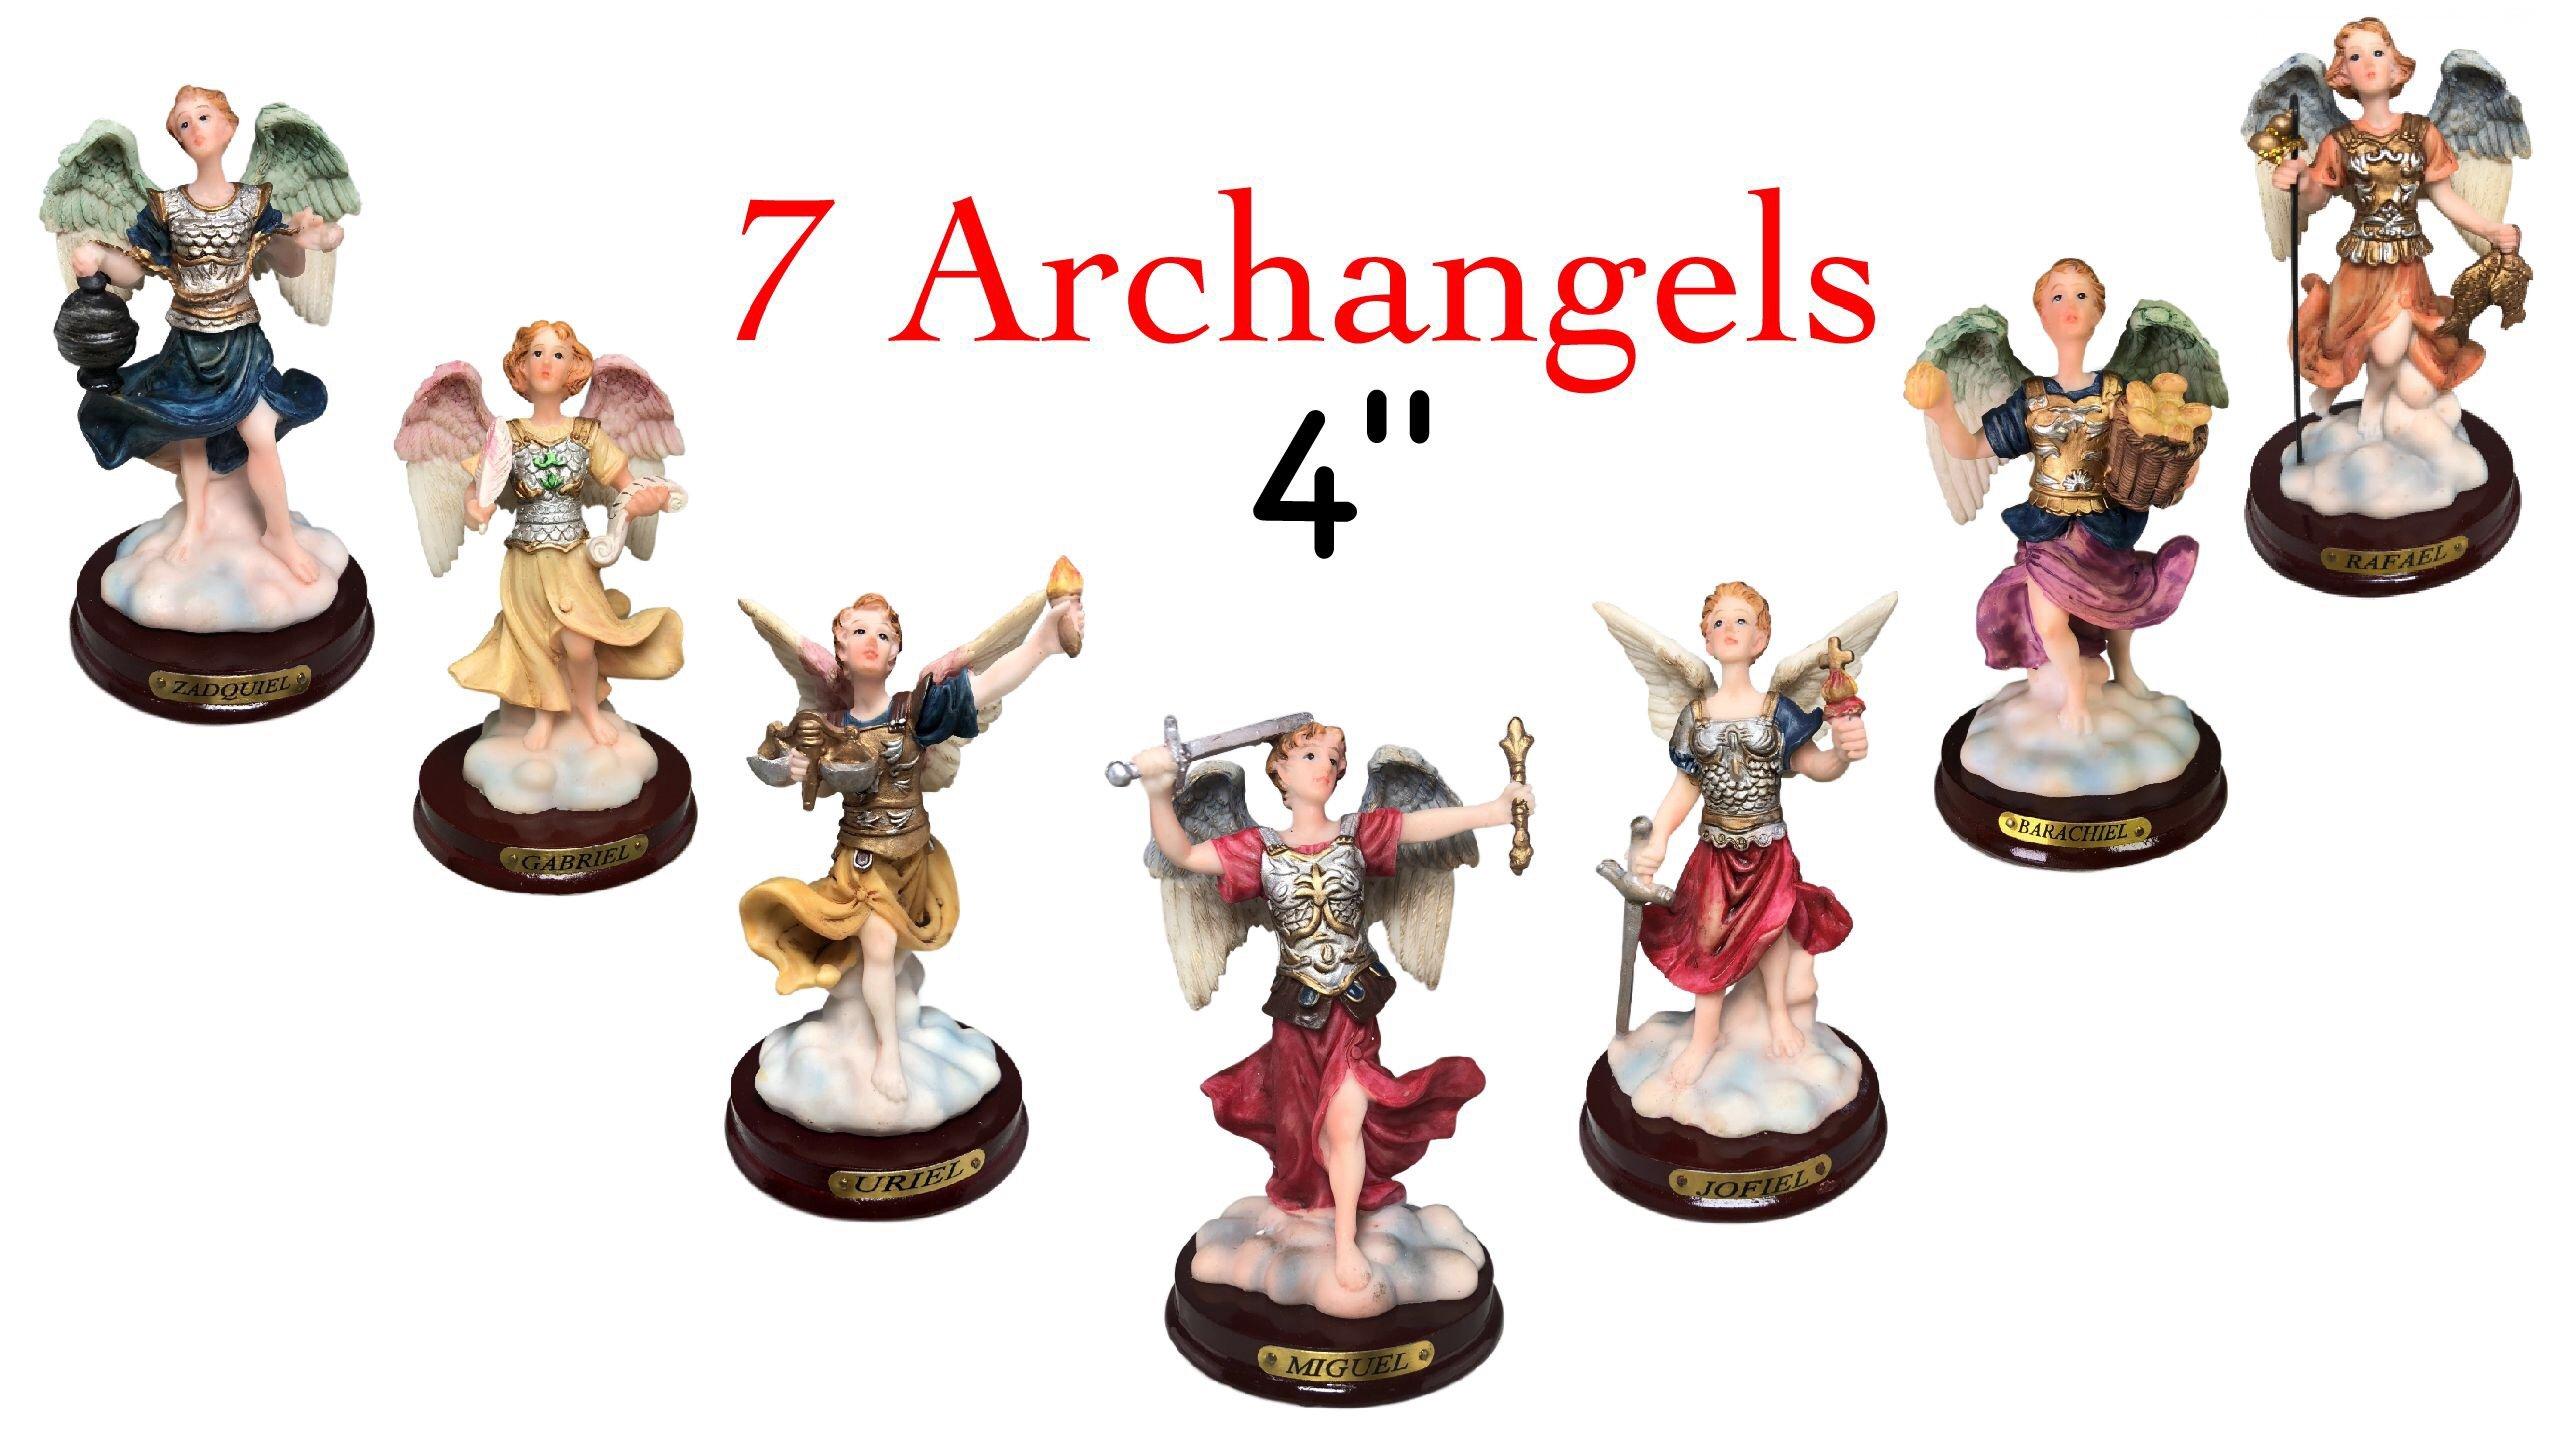 7 ARCHANGELS - 7 ARCANGELES 4 INCH Statues Complete Set